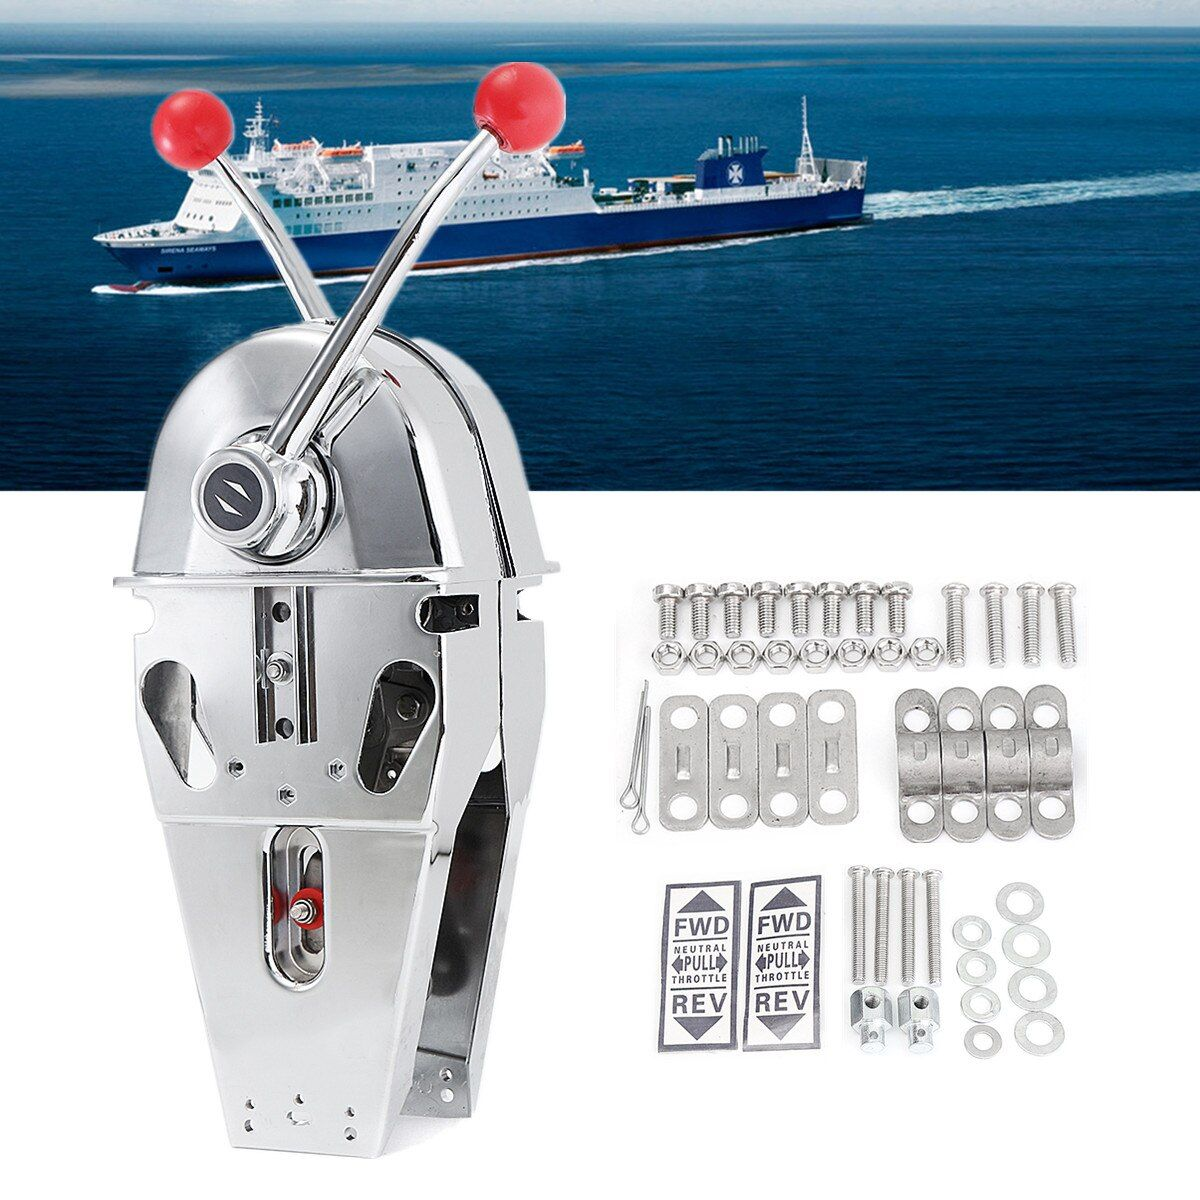 316 Edelstahl Marine Boot Twin Hebel Griff Top Mount Dual Motor Control Eingebaute Reibung Glatte Shitting/Drosseln